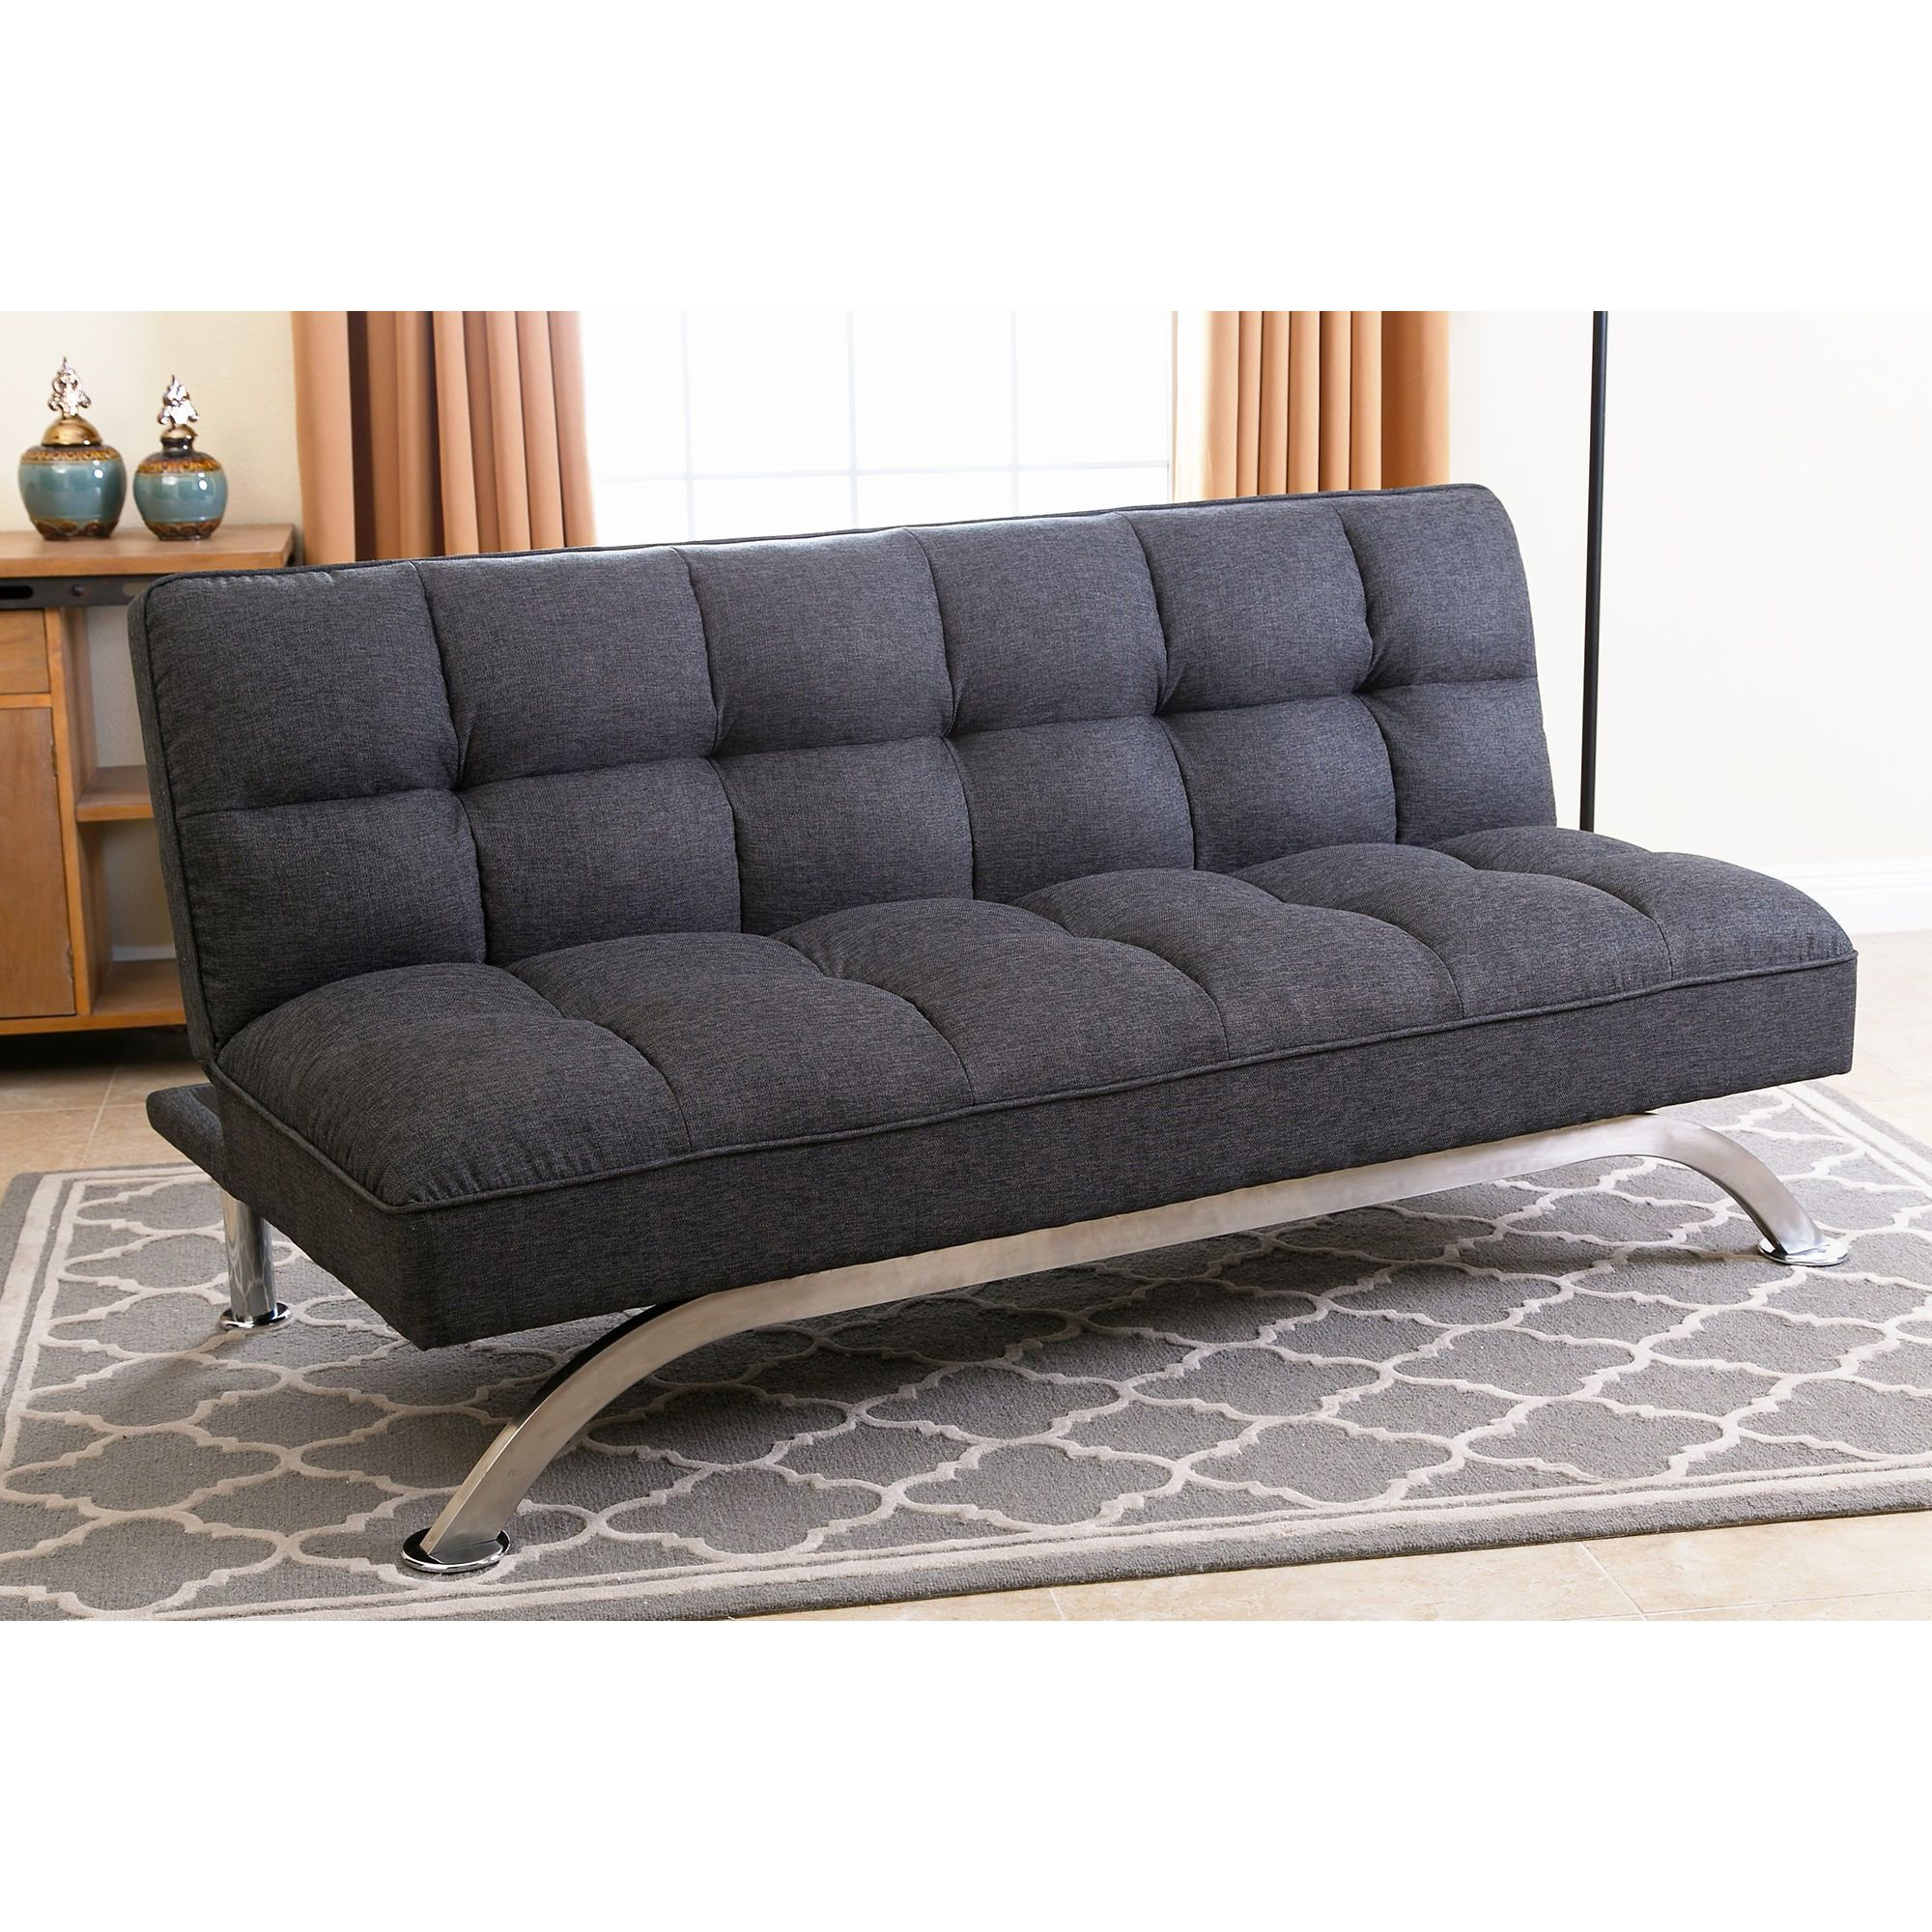 Abbyson Living Belize ClickClack Sofa Gray Sofa bed